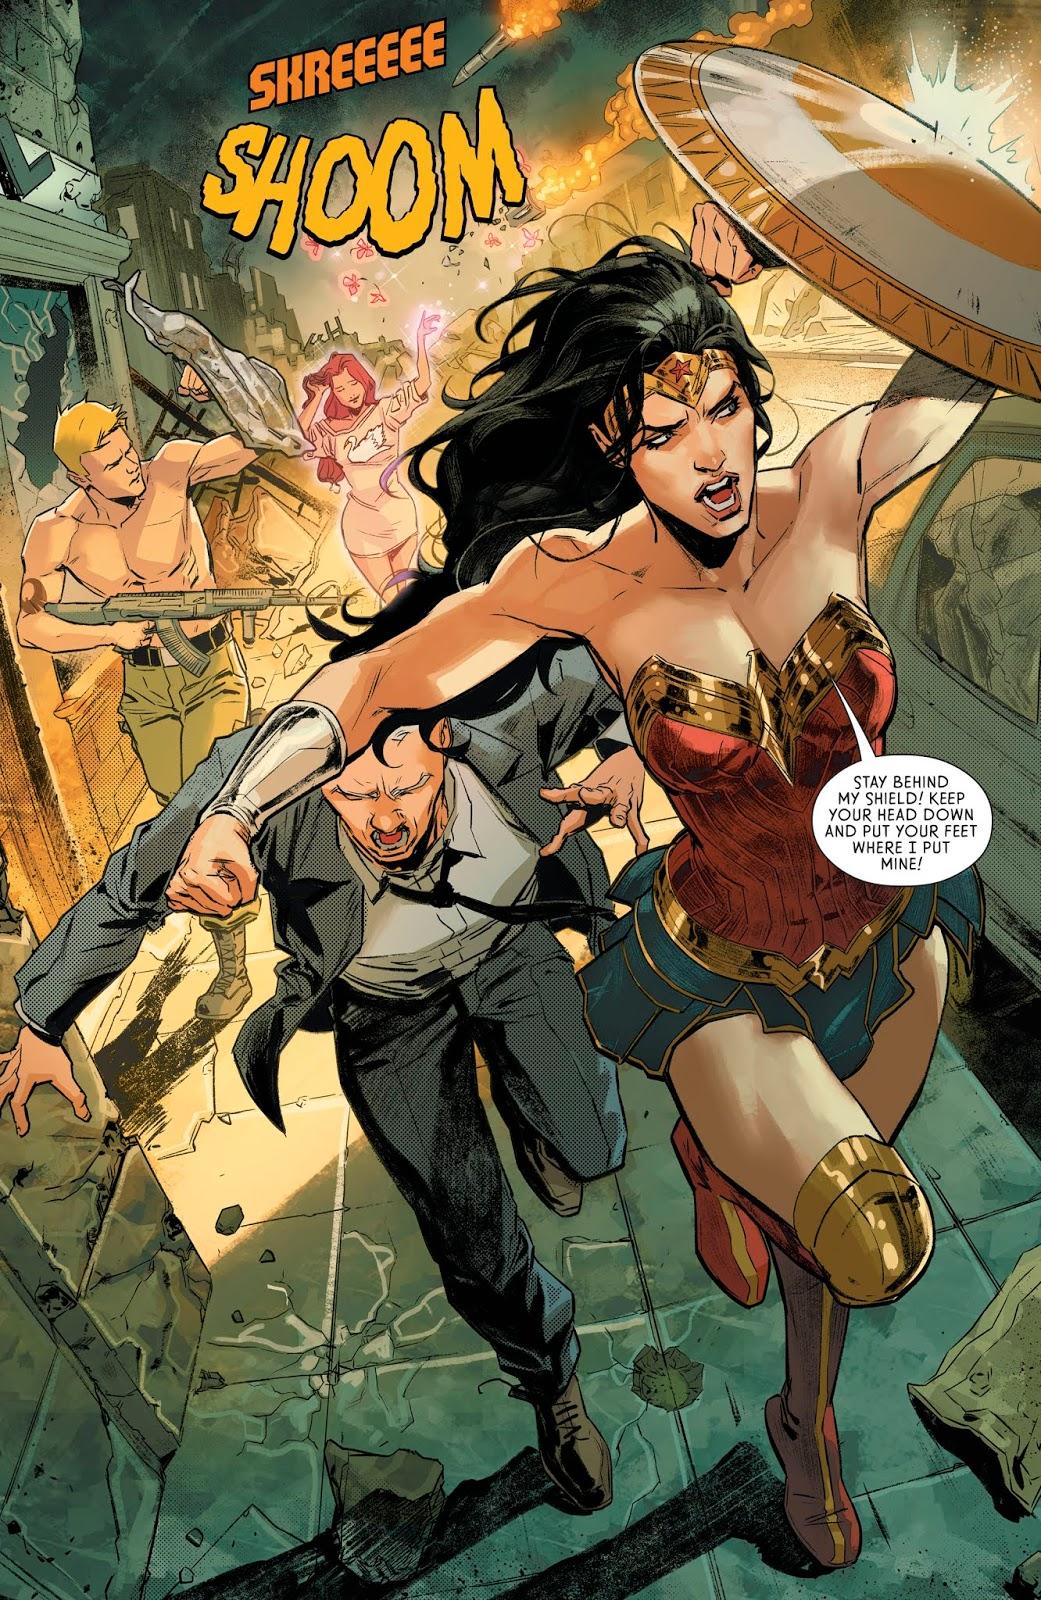 Wonder Woman Vol. 5 #61